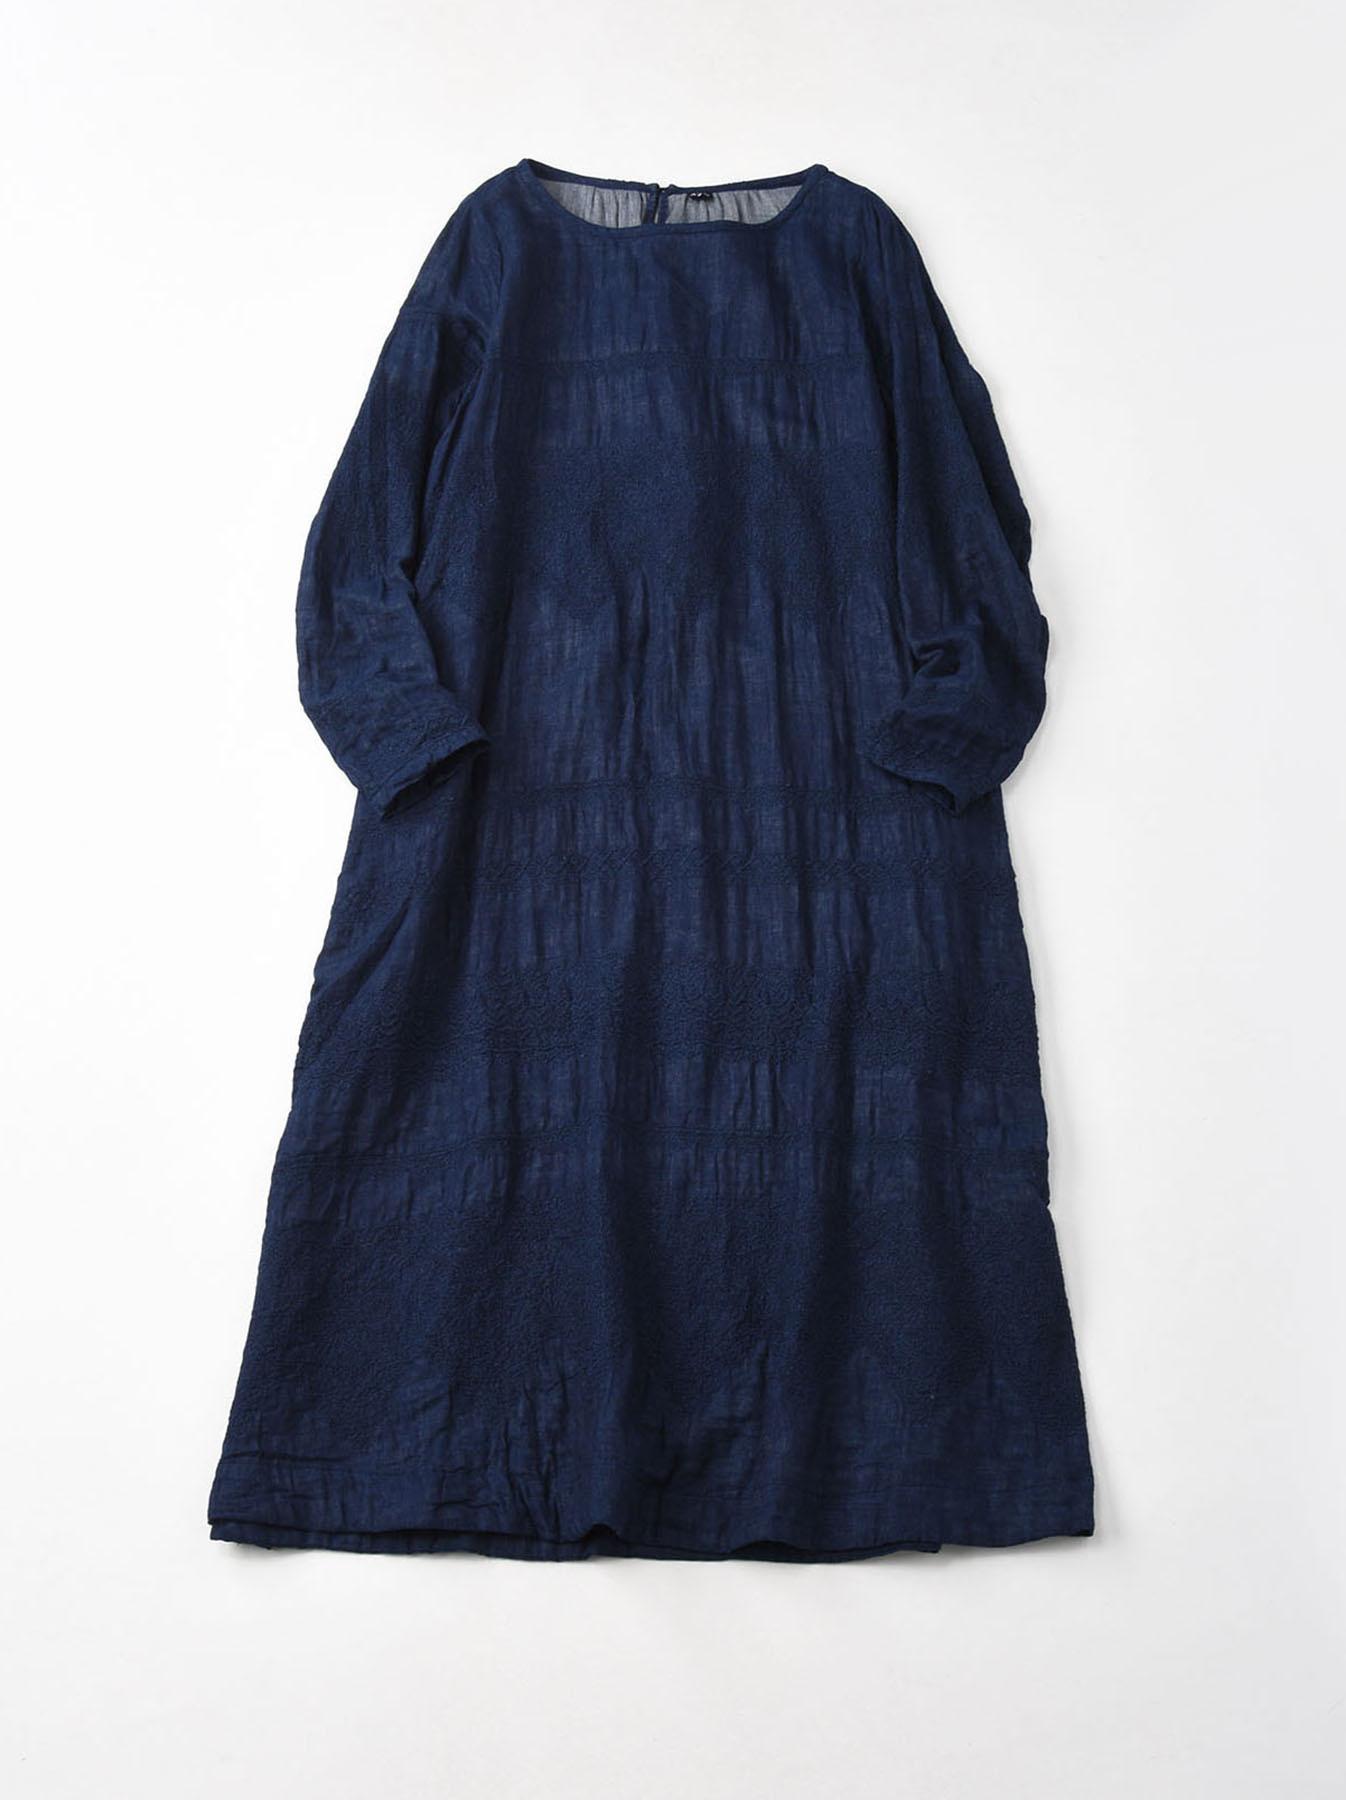 Indigo Double Cloth Lace Embroidery Dress-1